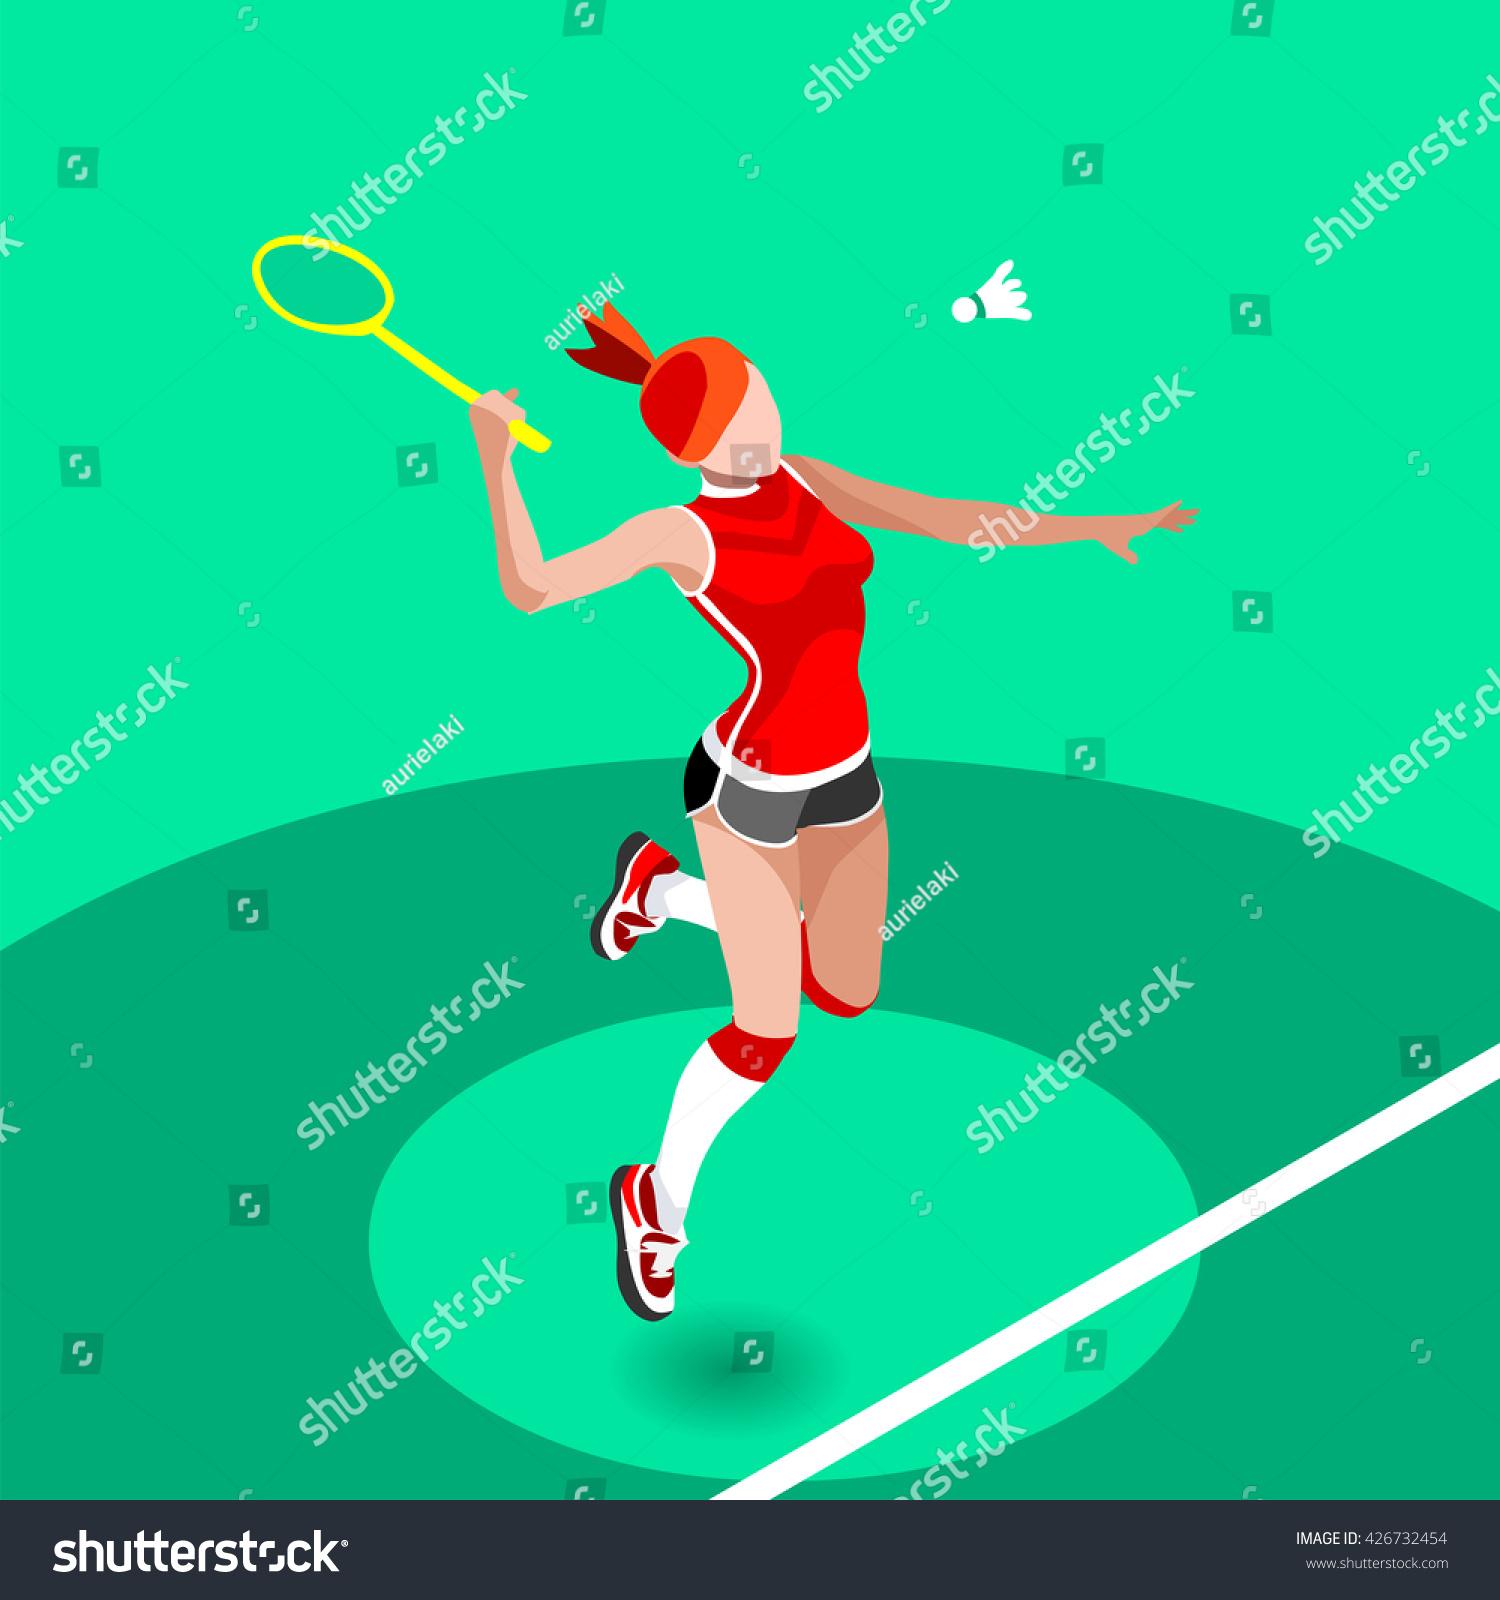 Squash sport icon